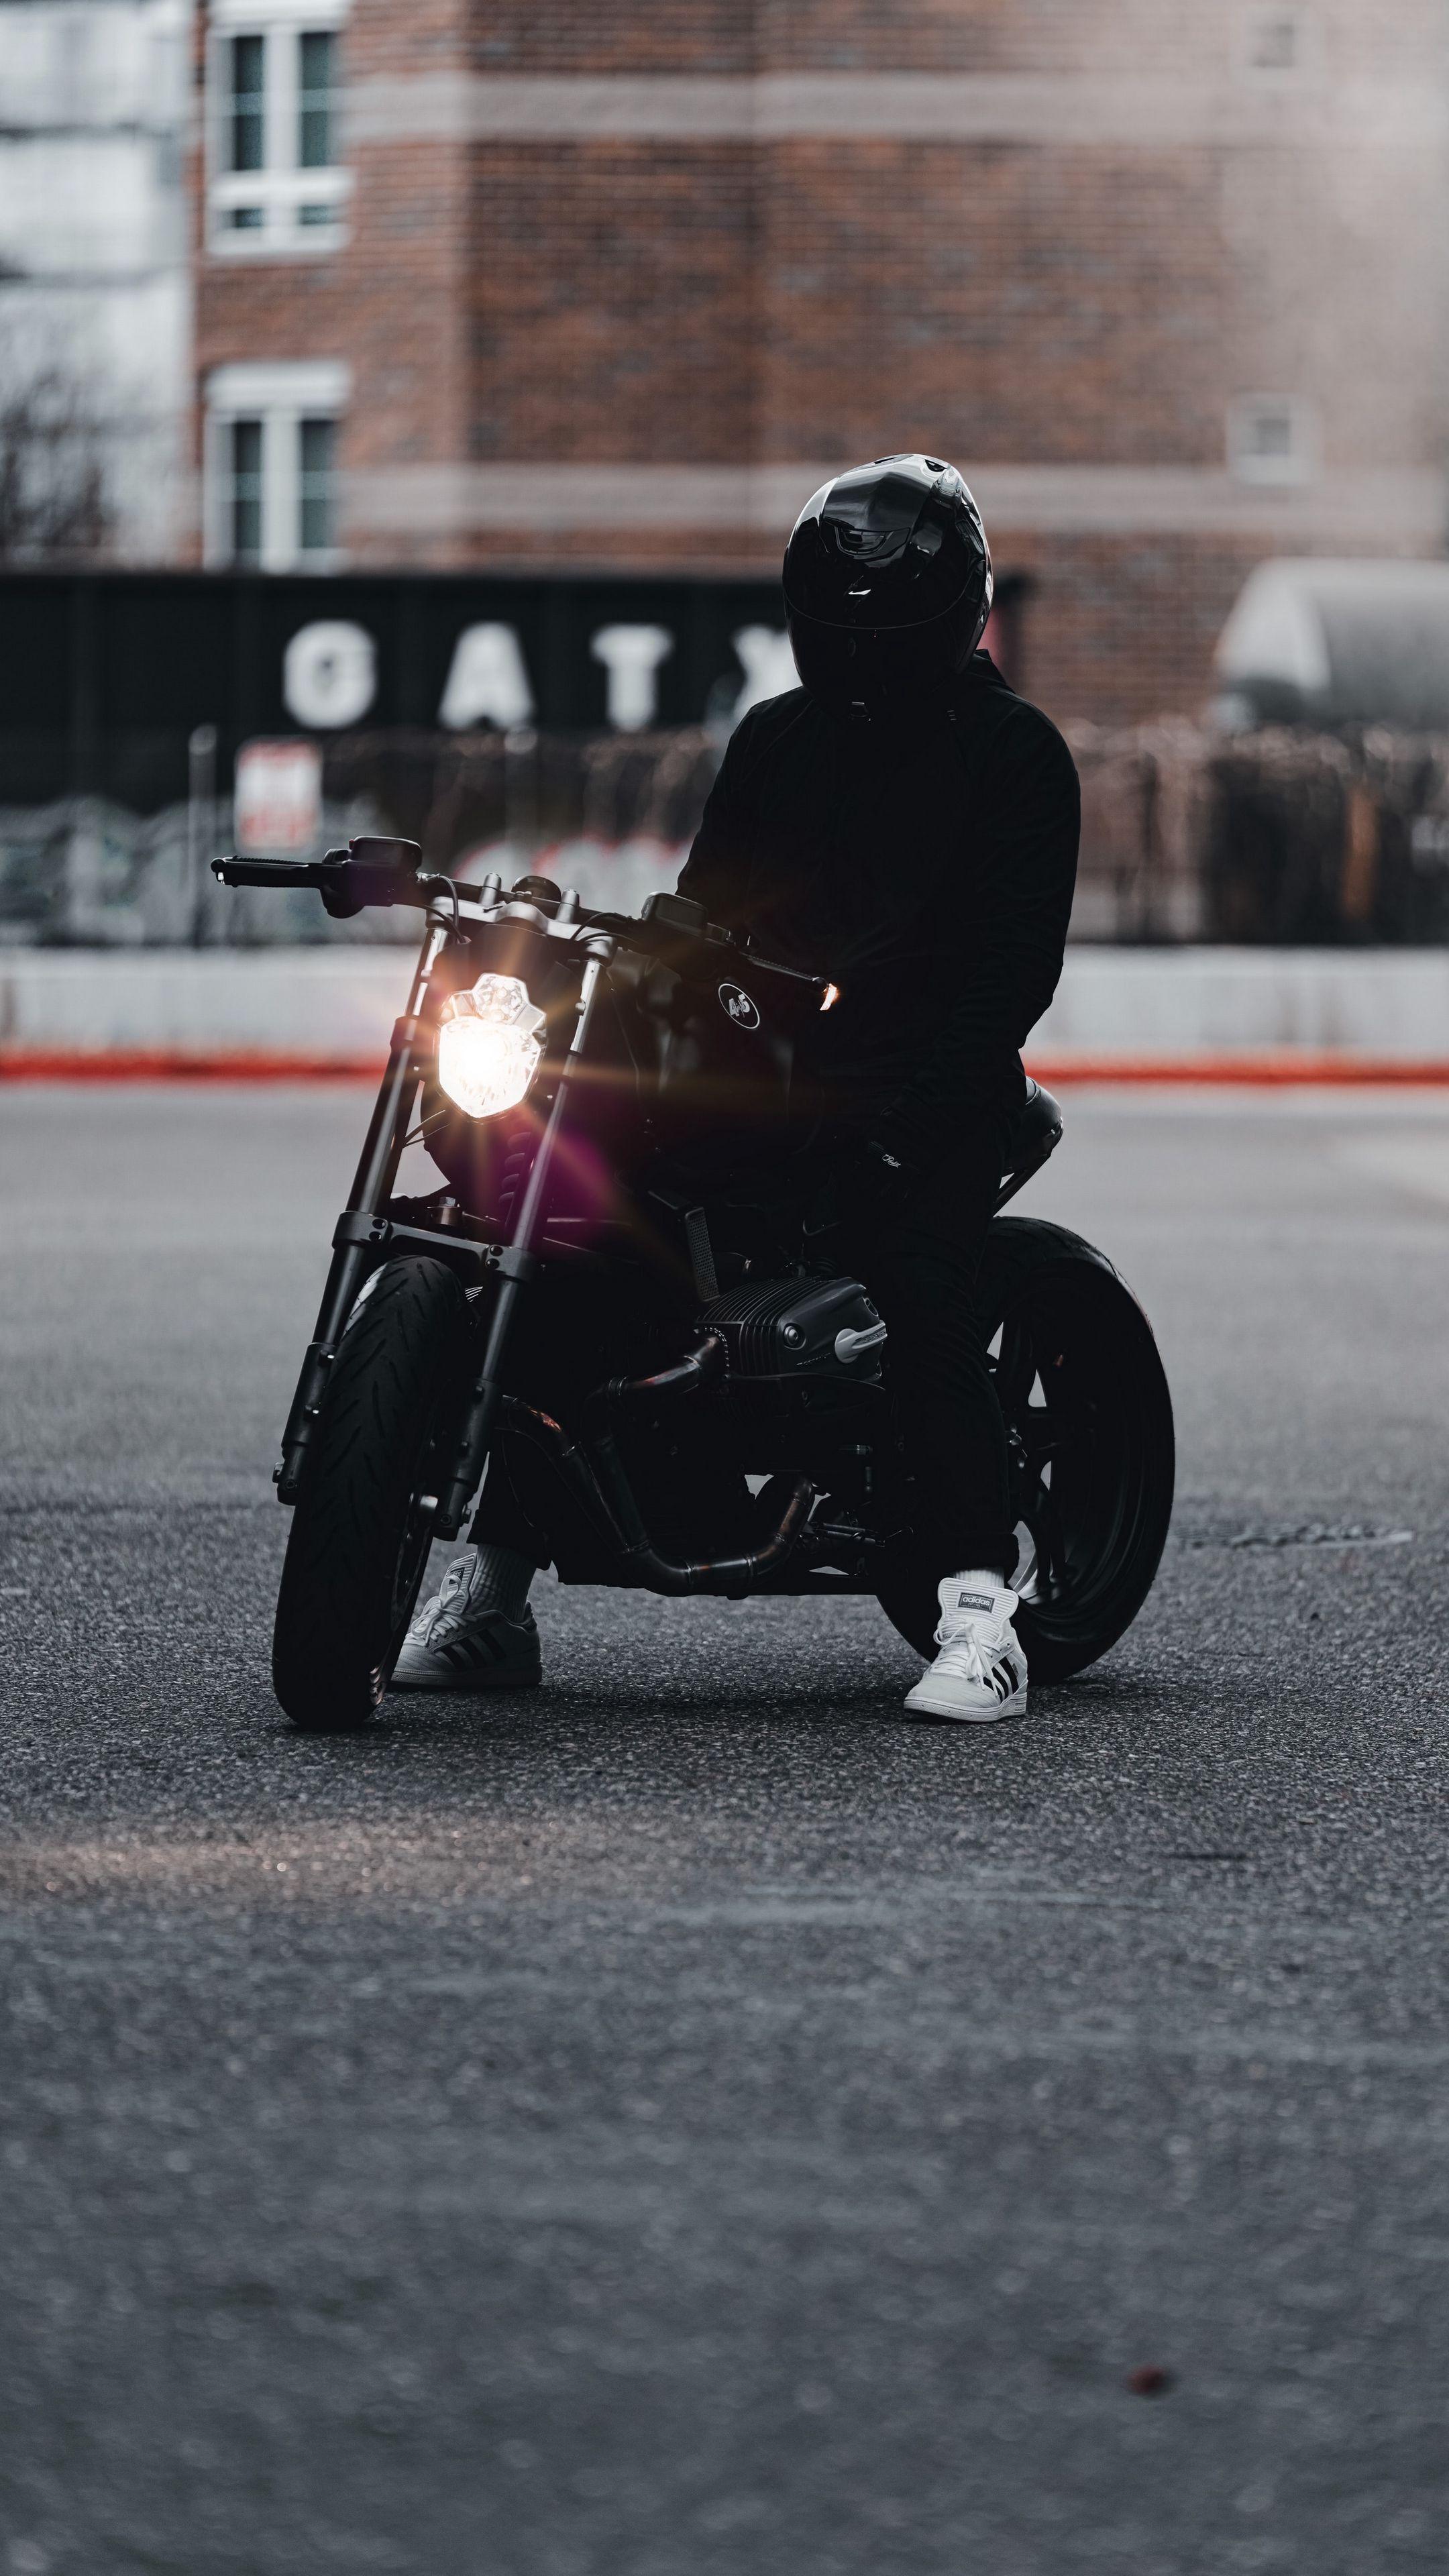 2160x3840 Обои мотоцикл, байк, мотоциклист, черный, свет, дорога